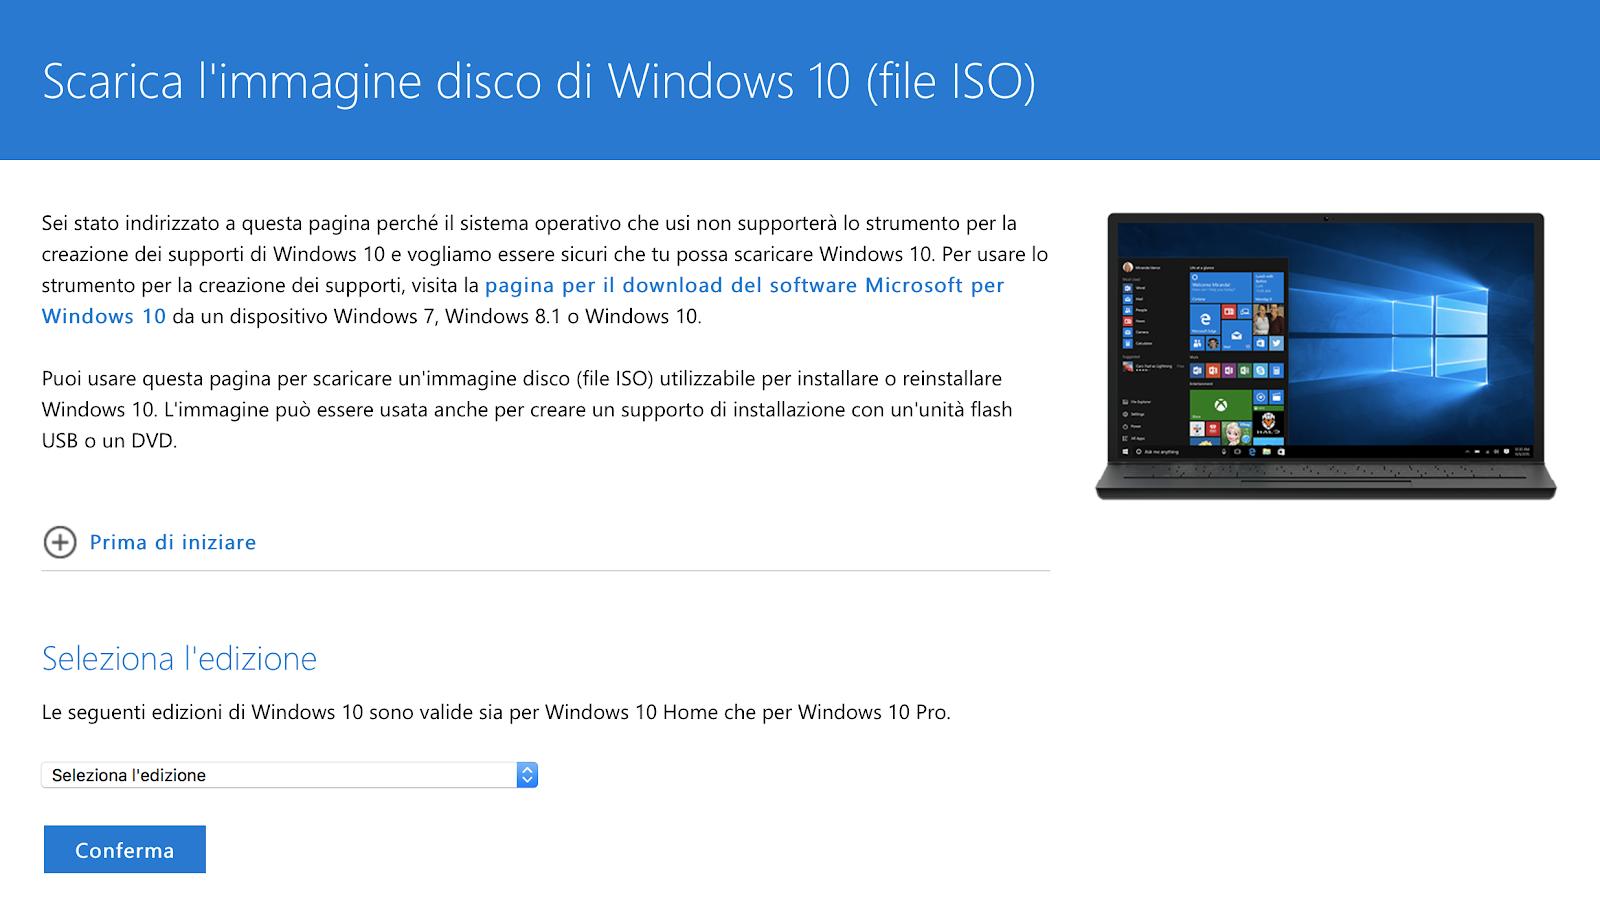 Dove scaricare Windows 10 gratis